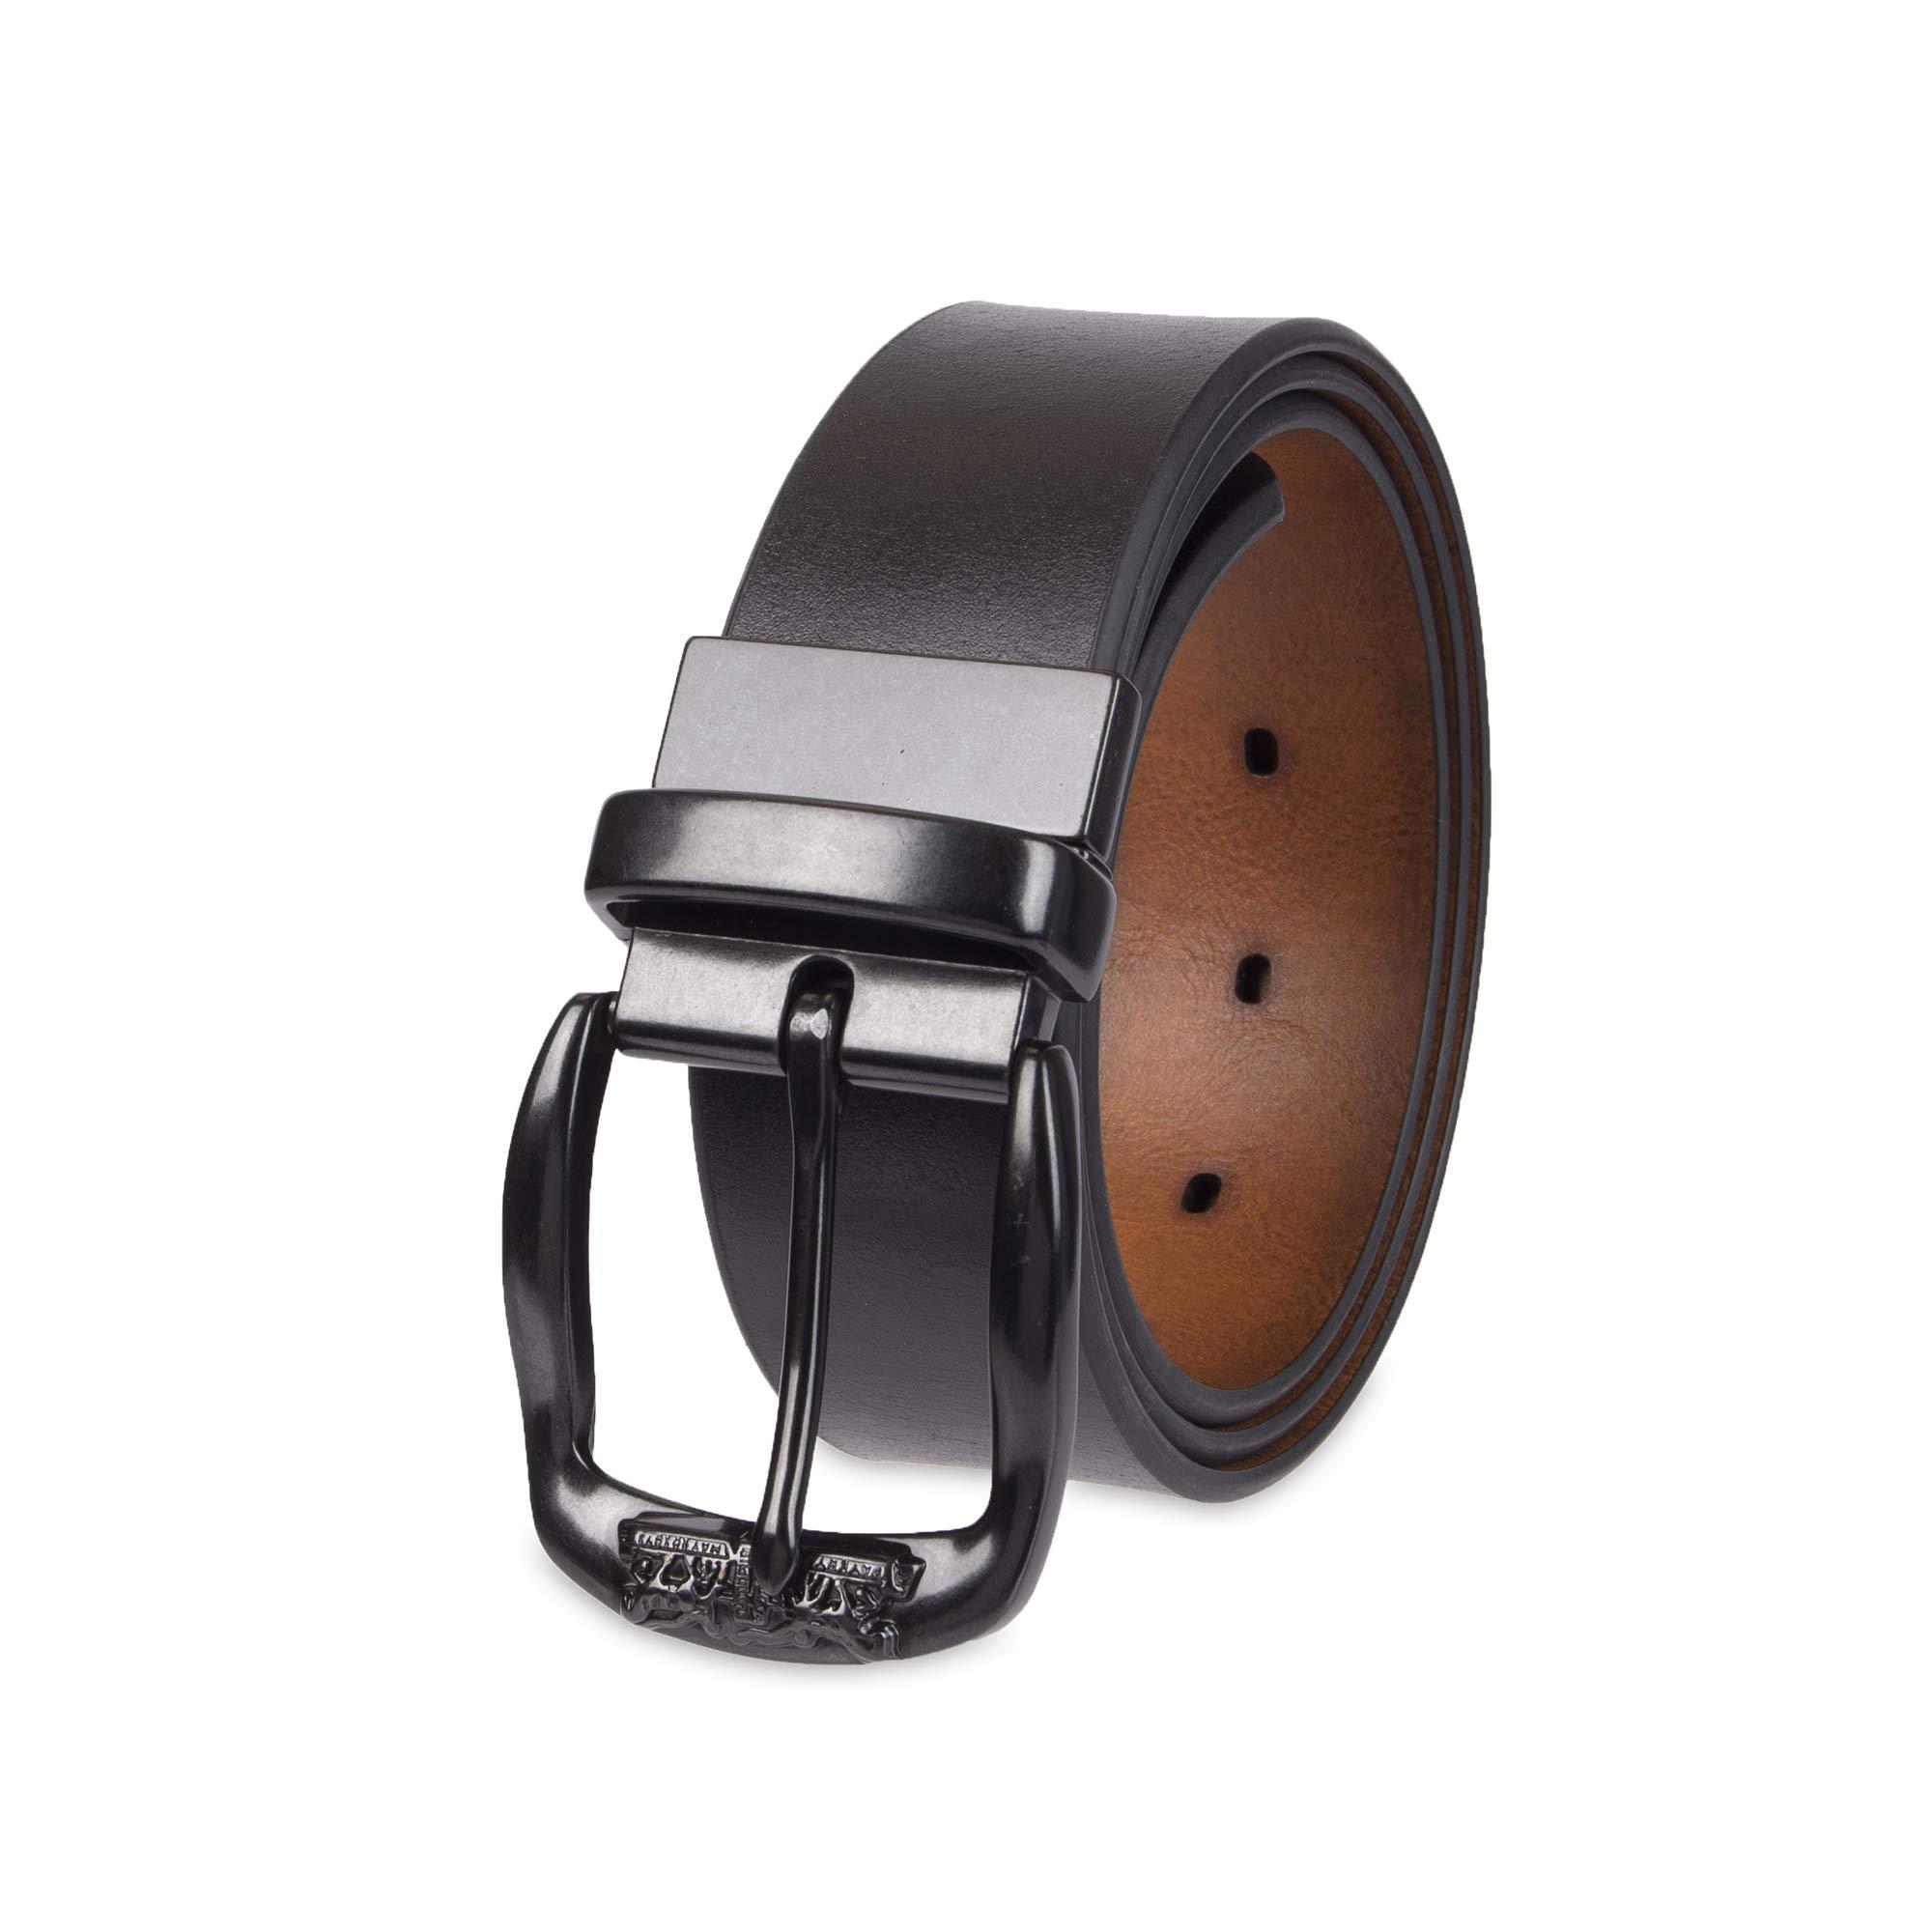 Levi's Men's Leather Reversible Belt with Logo on Buckle-Black/Tan, Medium